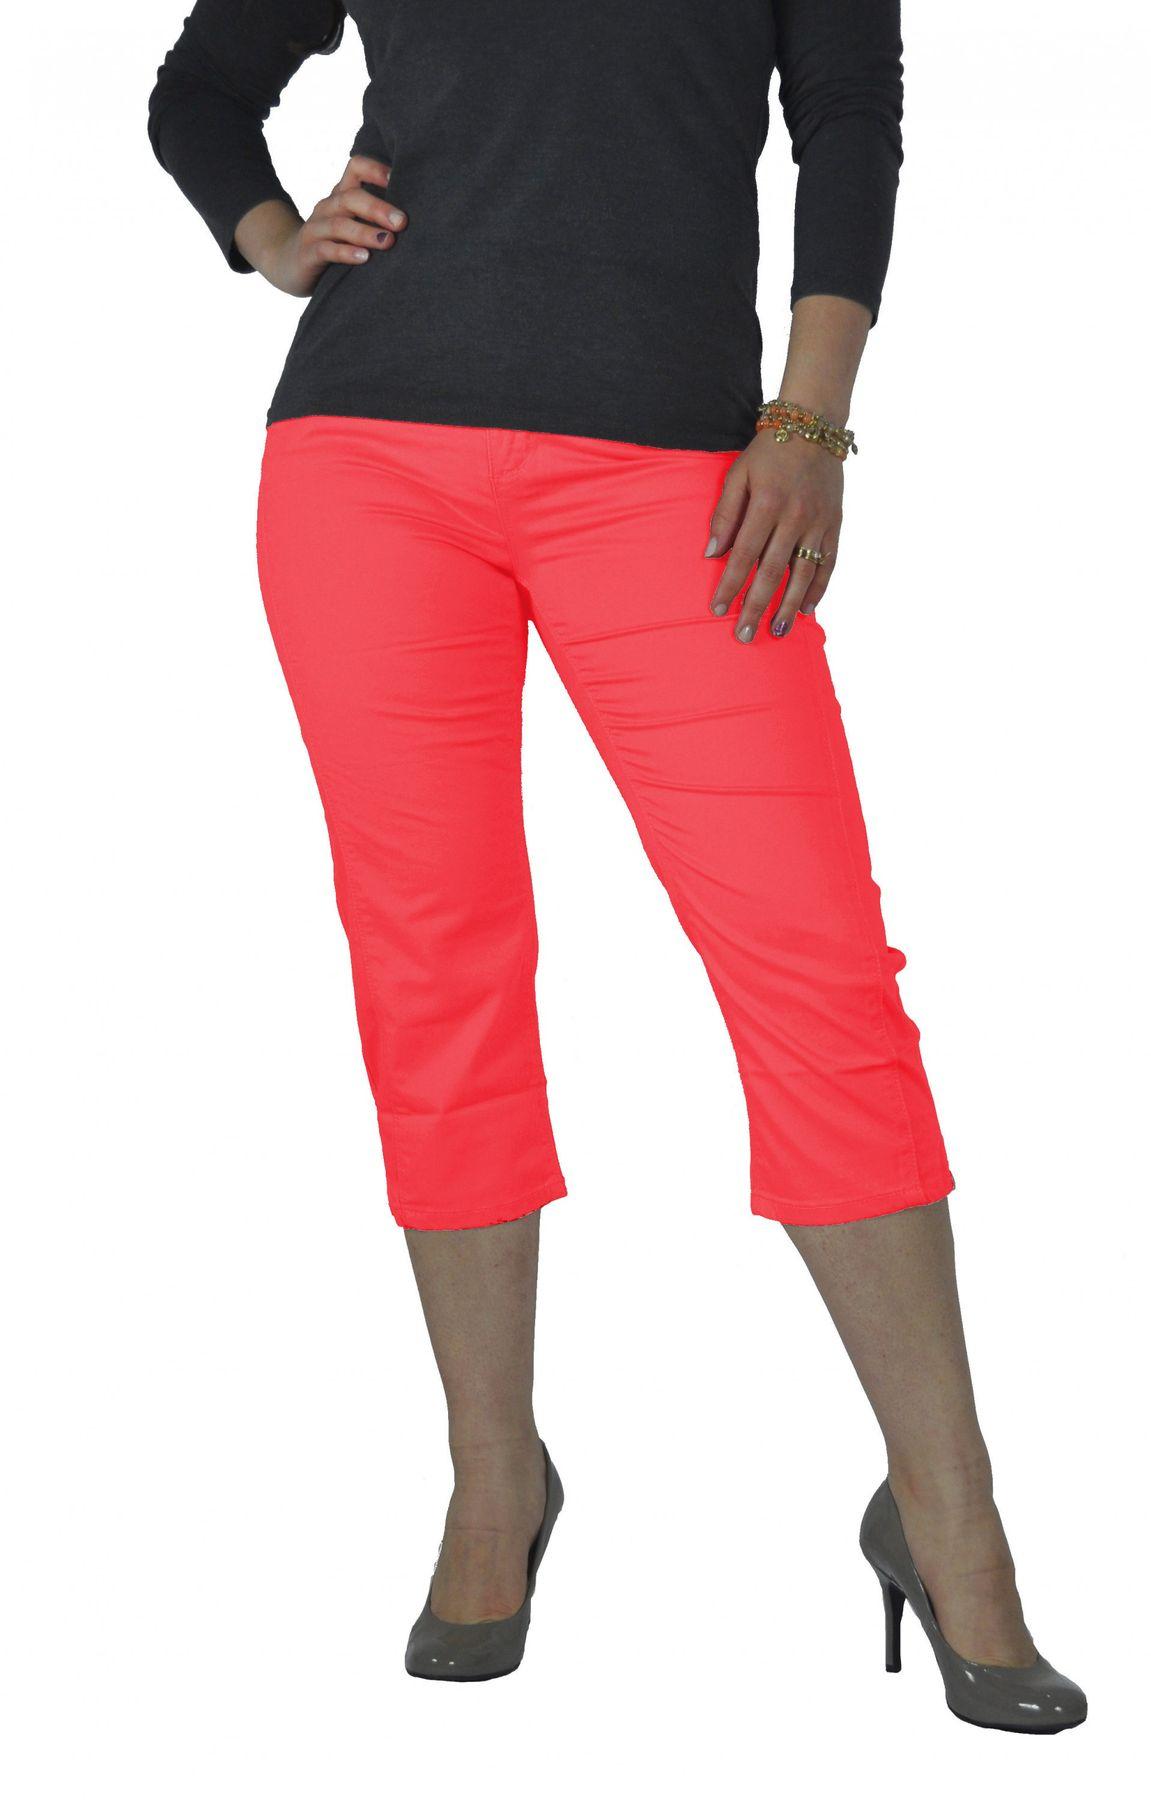 Stooker - Damen 3/4 Capri Stretch Hose in verschiedenen Farben, Tahiti (0482) – Bild 3